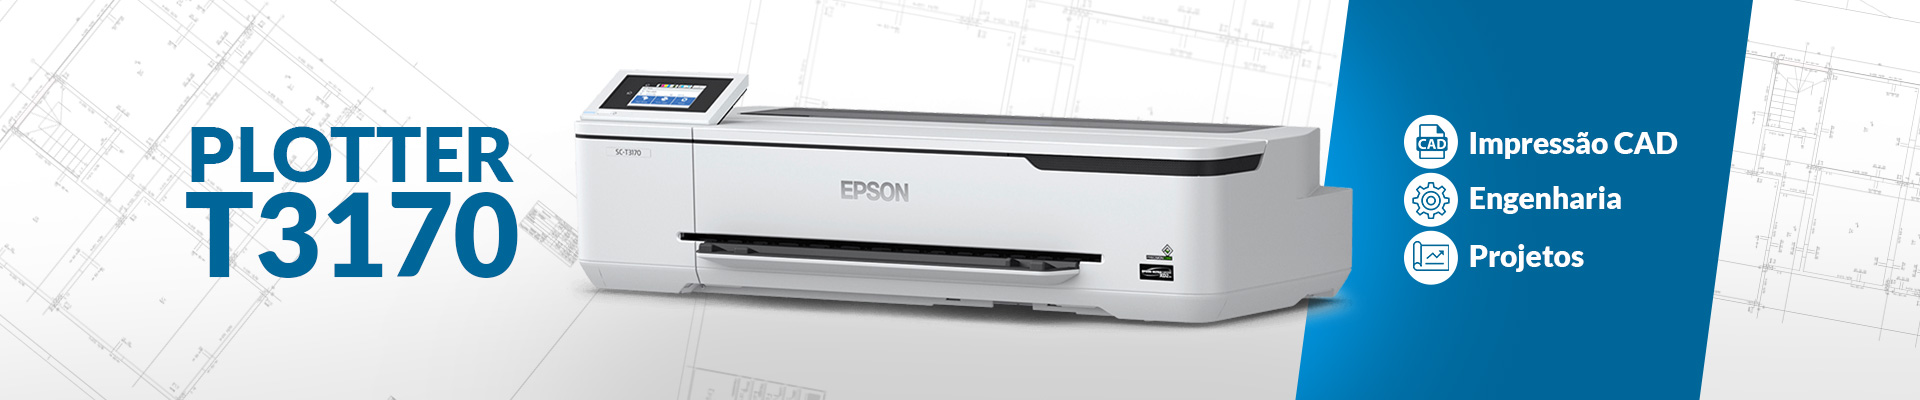 Plotter T3170 para impressao CAD Engenharia Projetos